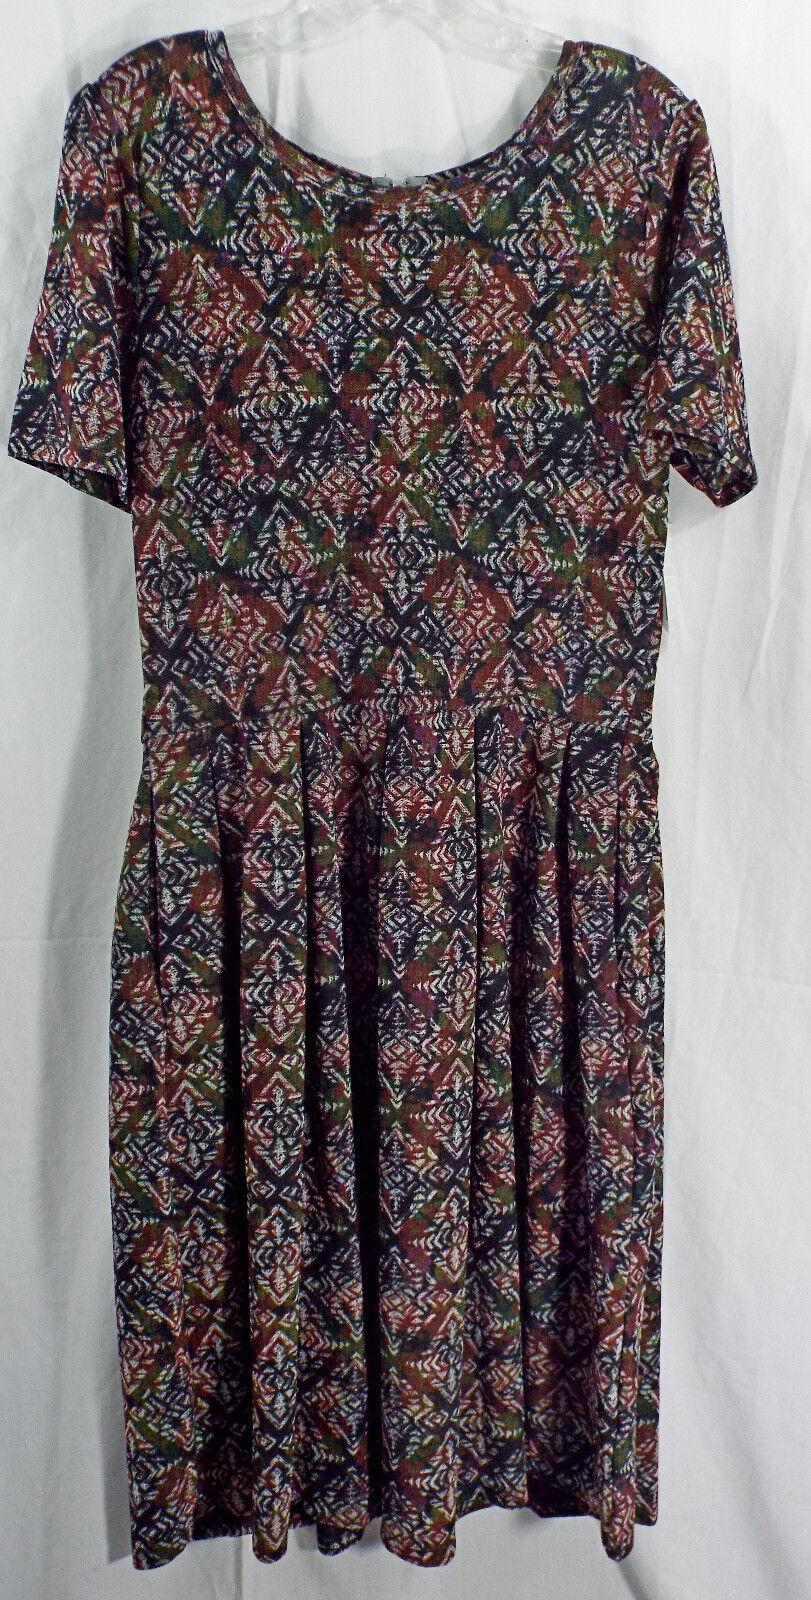 damen LuLaRoe Dress XL Amelia Multi ColGoldt Geometic NWT